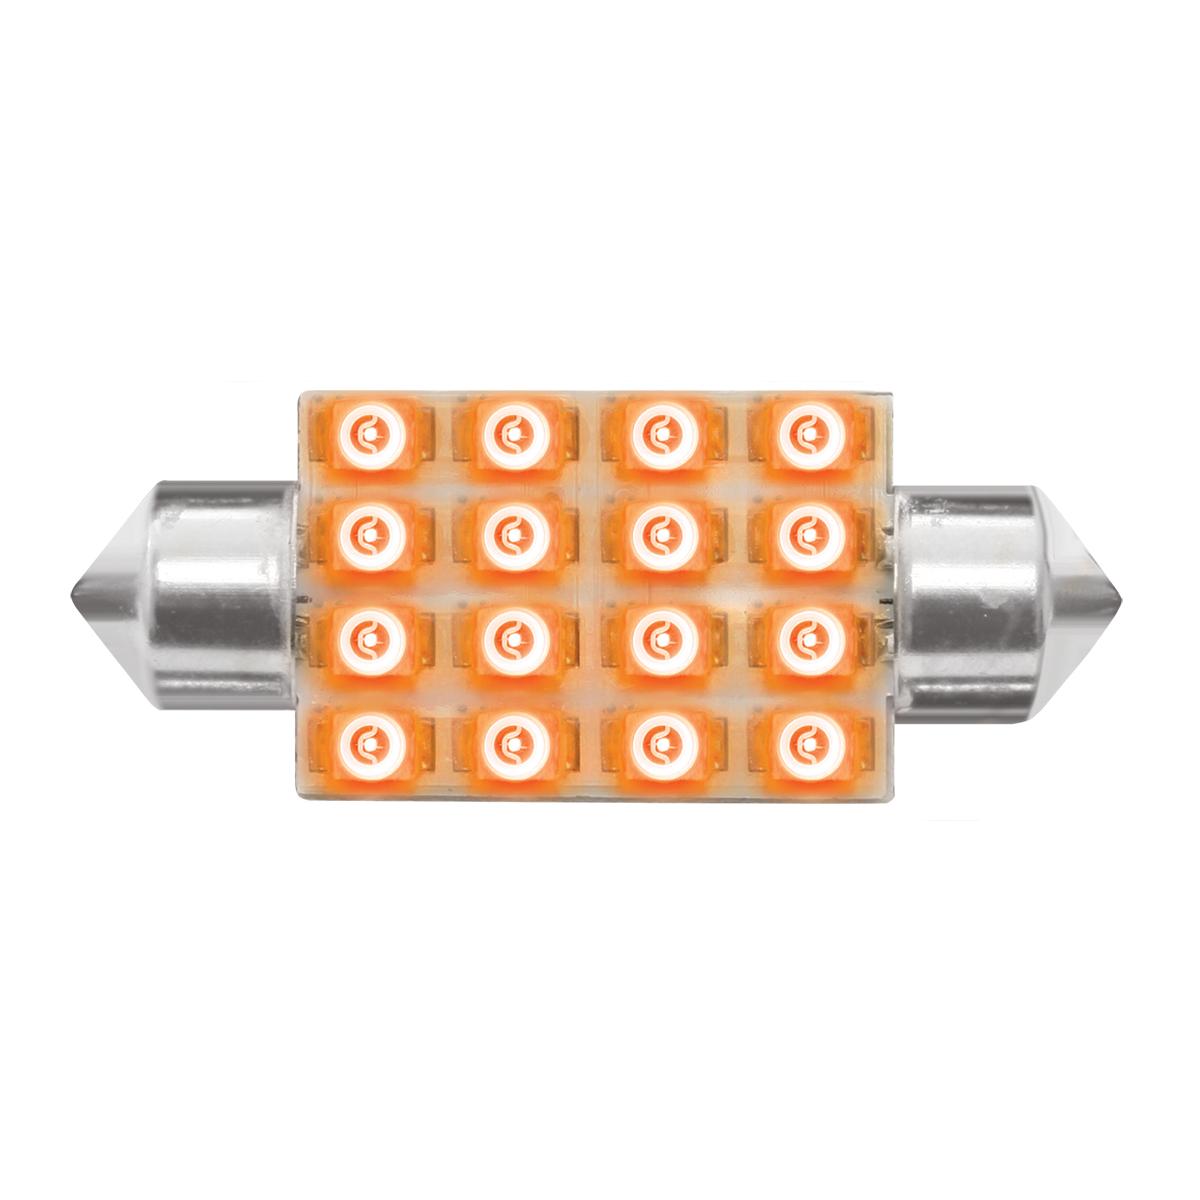 76100 Amber 211-2 Dome Type 16 LED Light Bulb